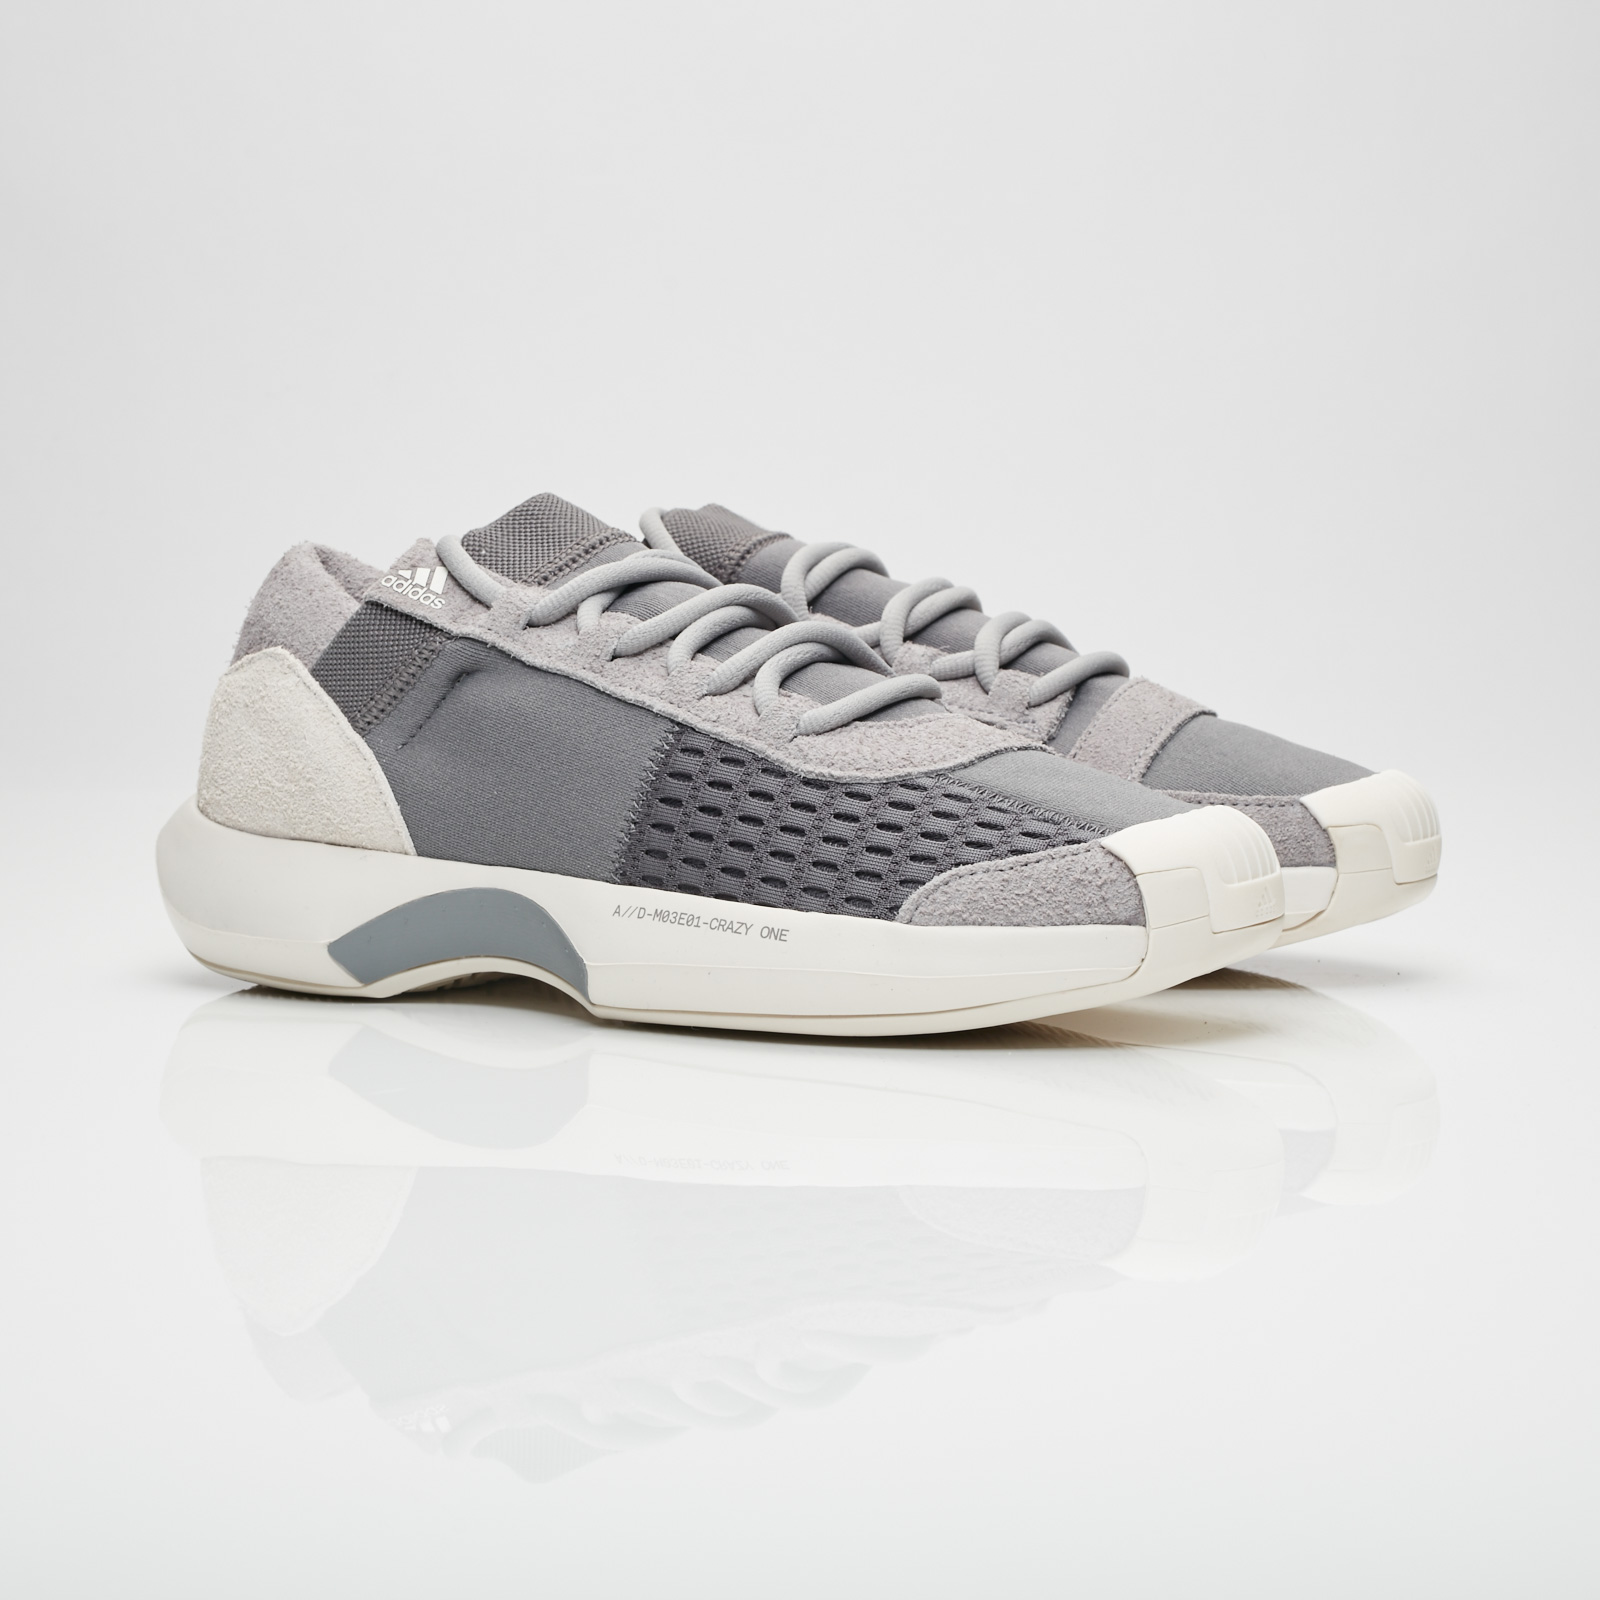 aece42989 adidas Crazy 1 ADV - Cq1868 - Sneakersnstuff